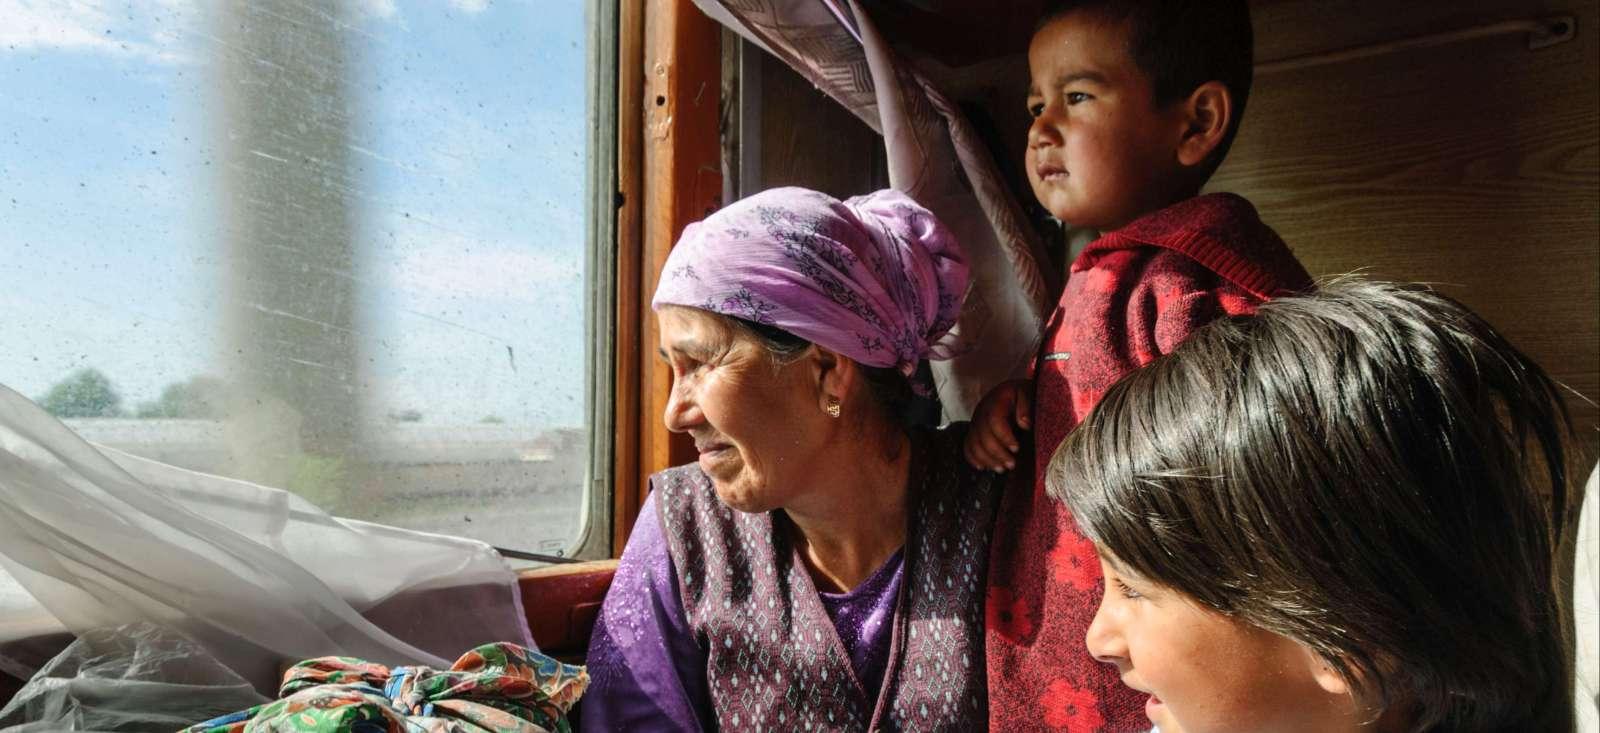 Voyage en véhicule : Sur les traces de Marco Polo�en train !